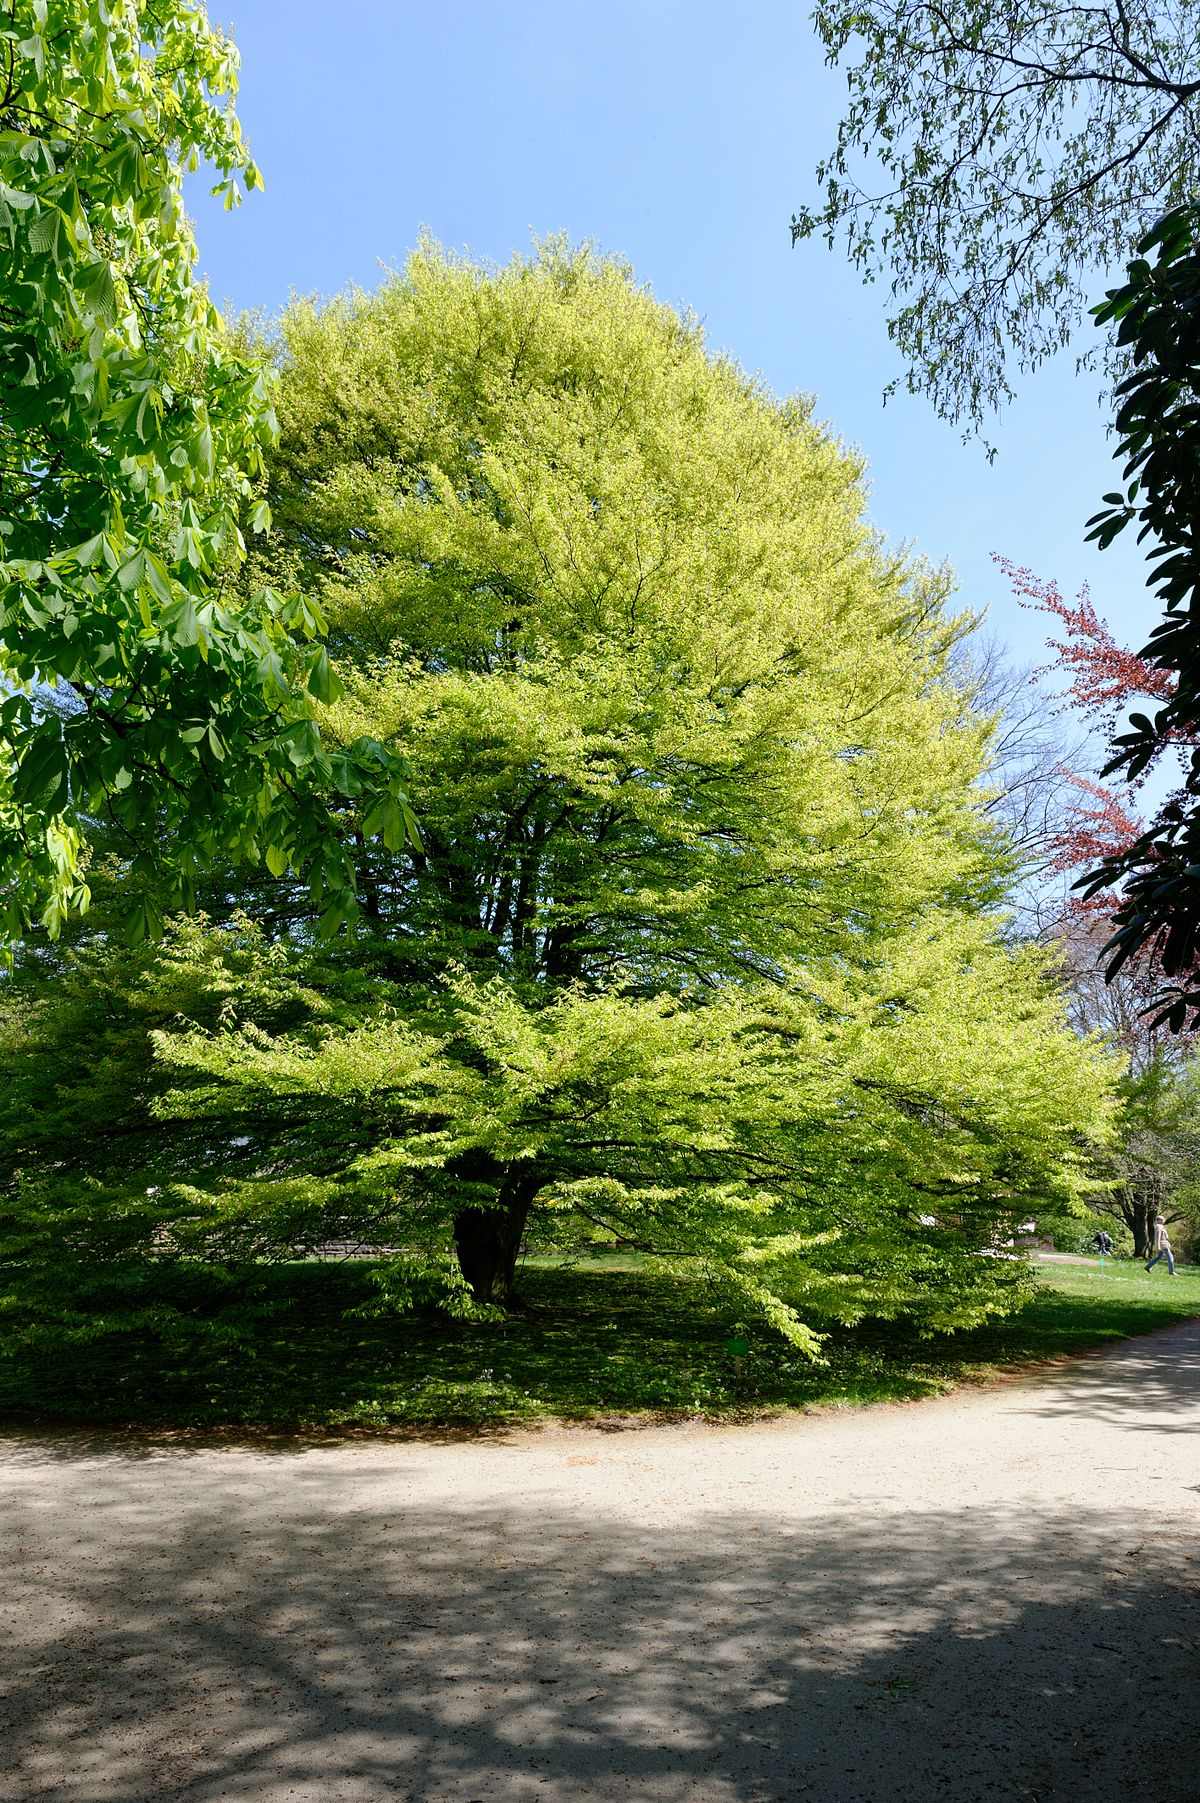 Botanischer Garten Italien Gardasee: Botanischer Garten Solingen